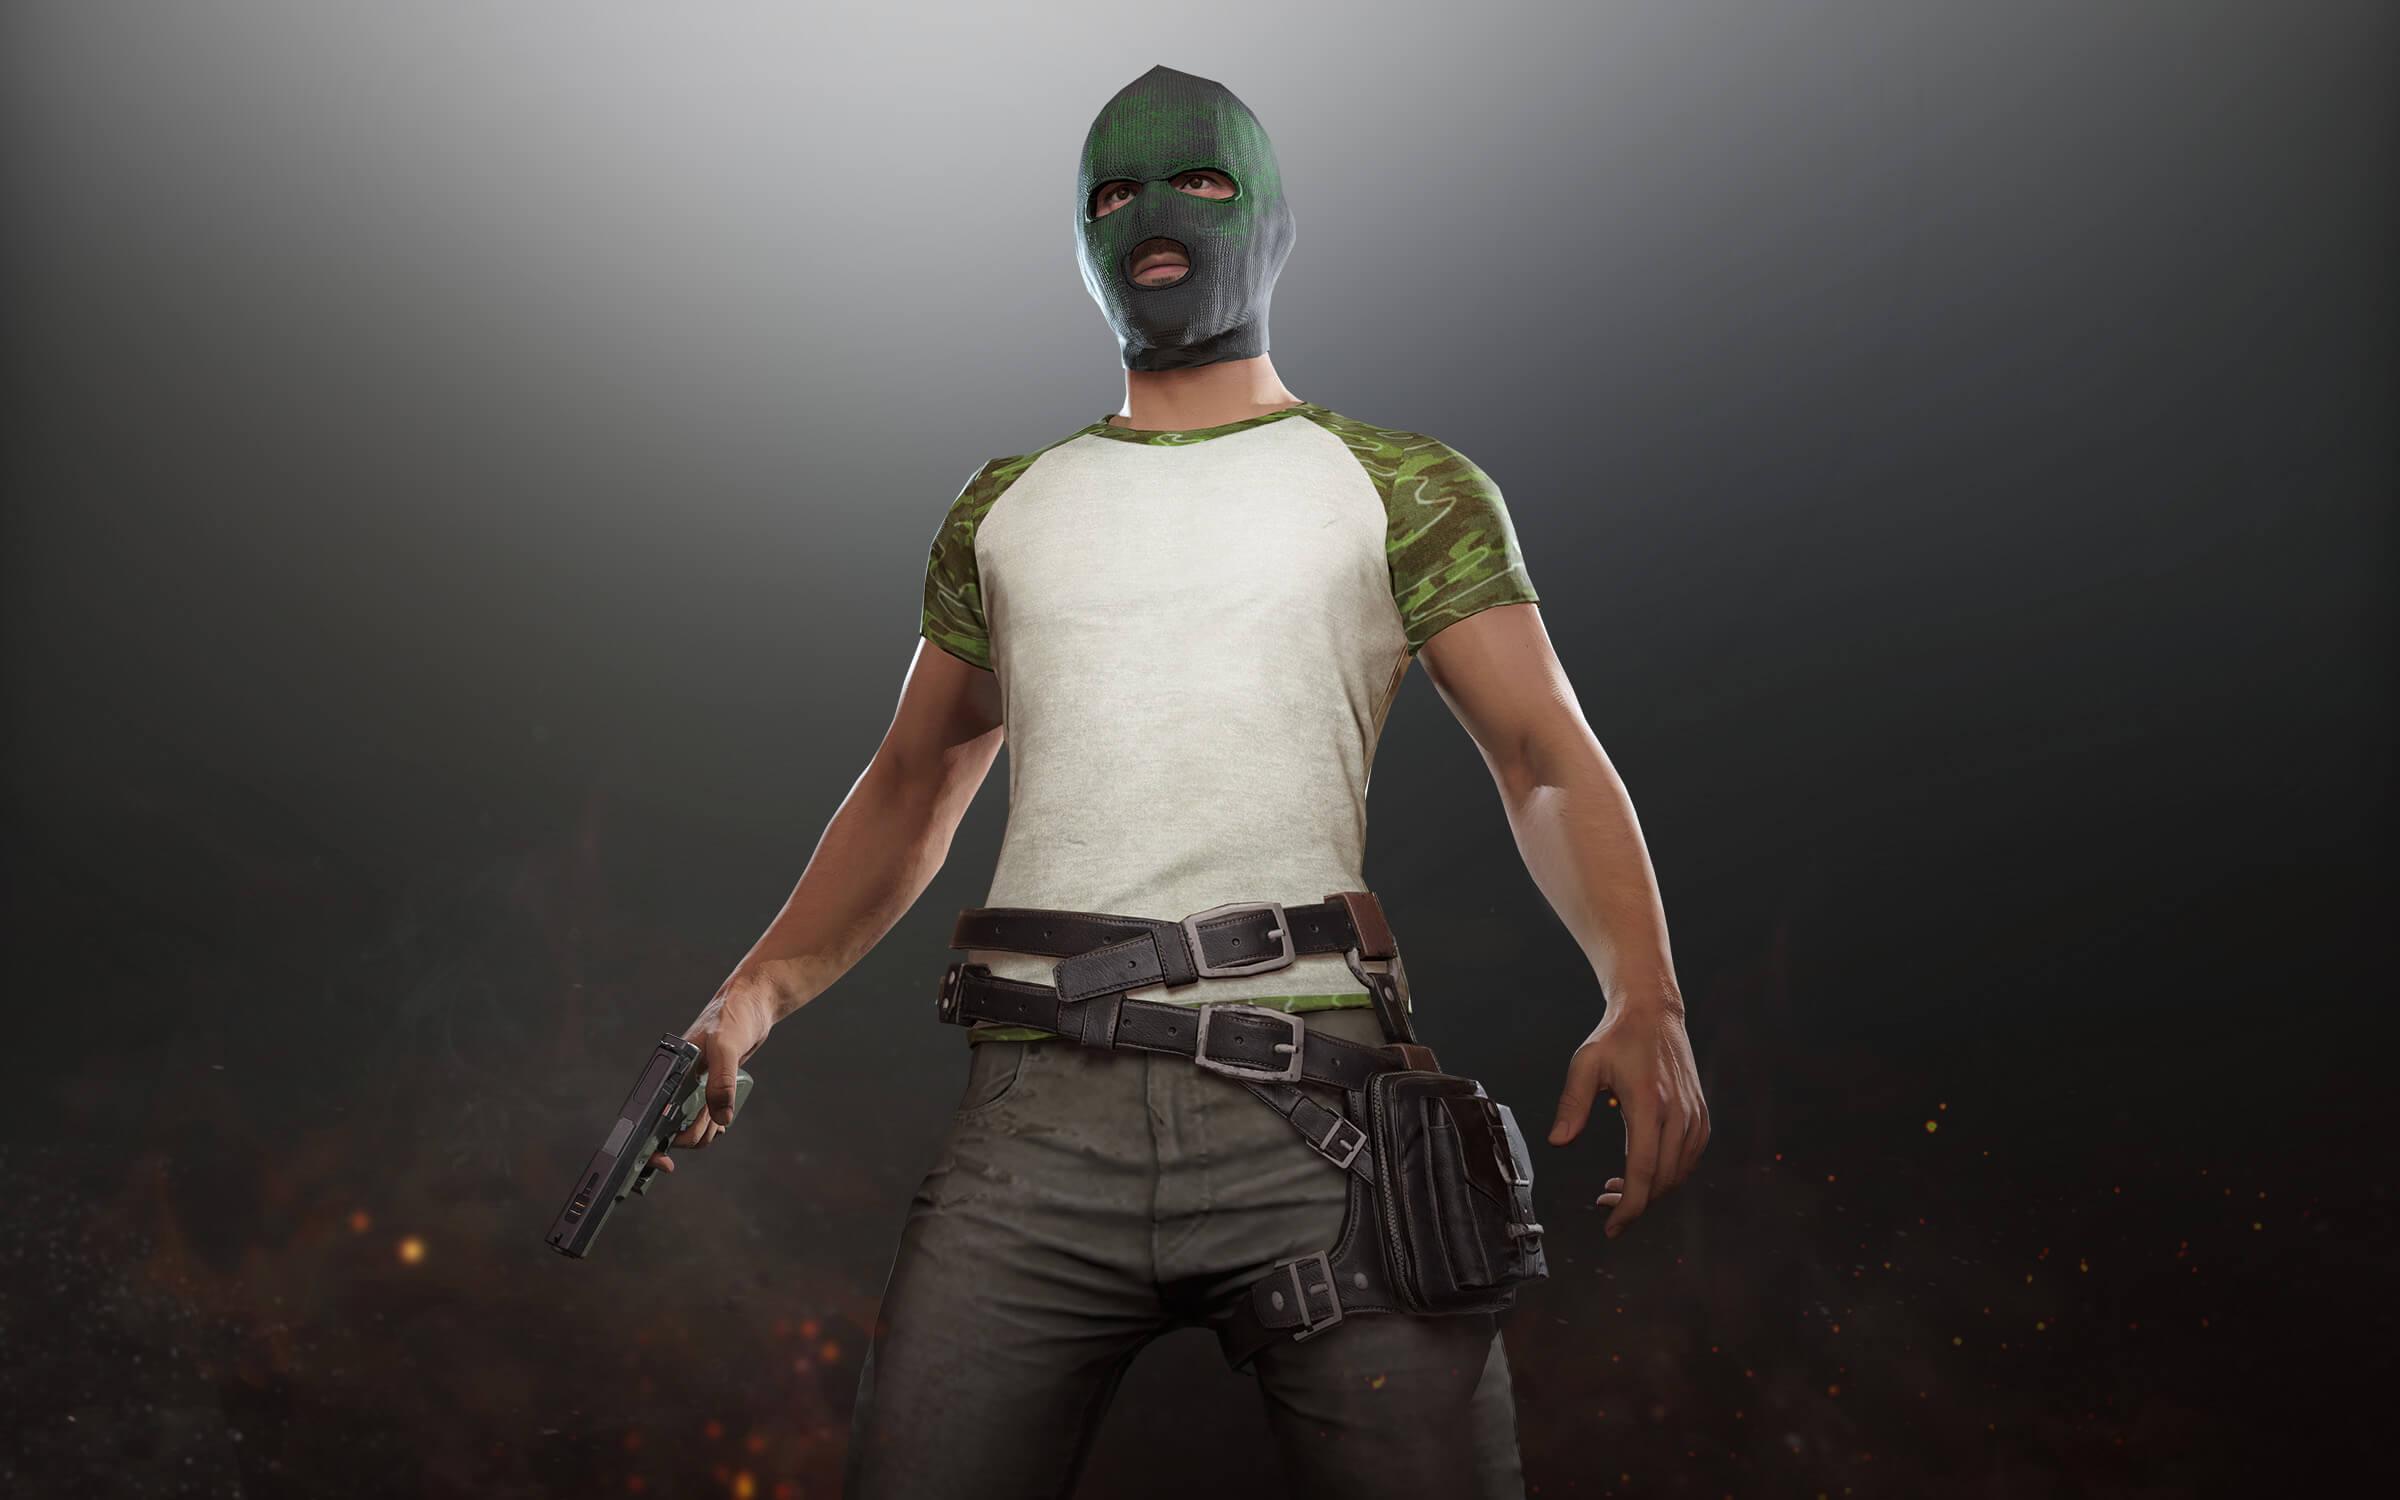 PUBG Xbox XGP The Warrior Pack